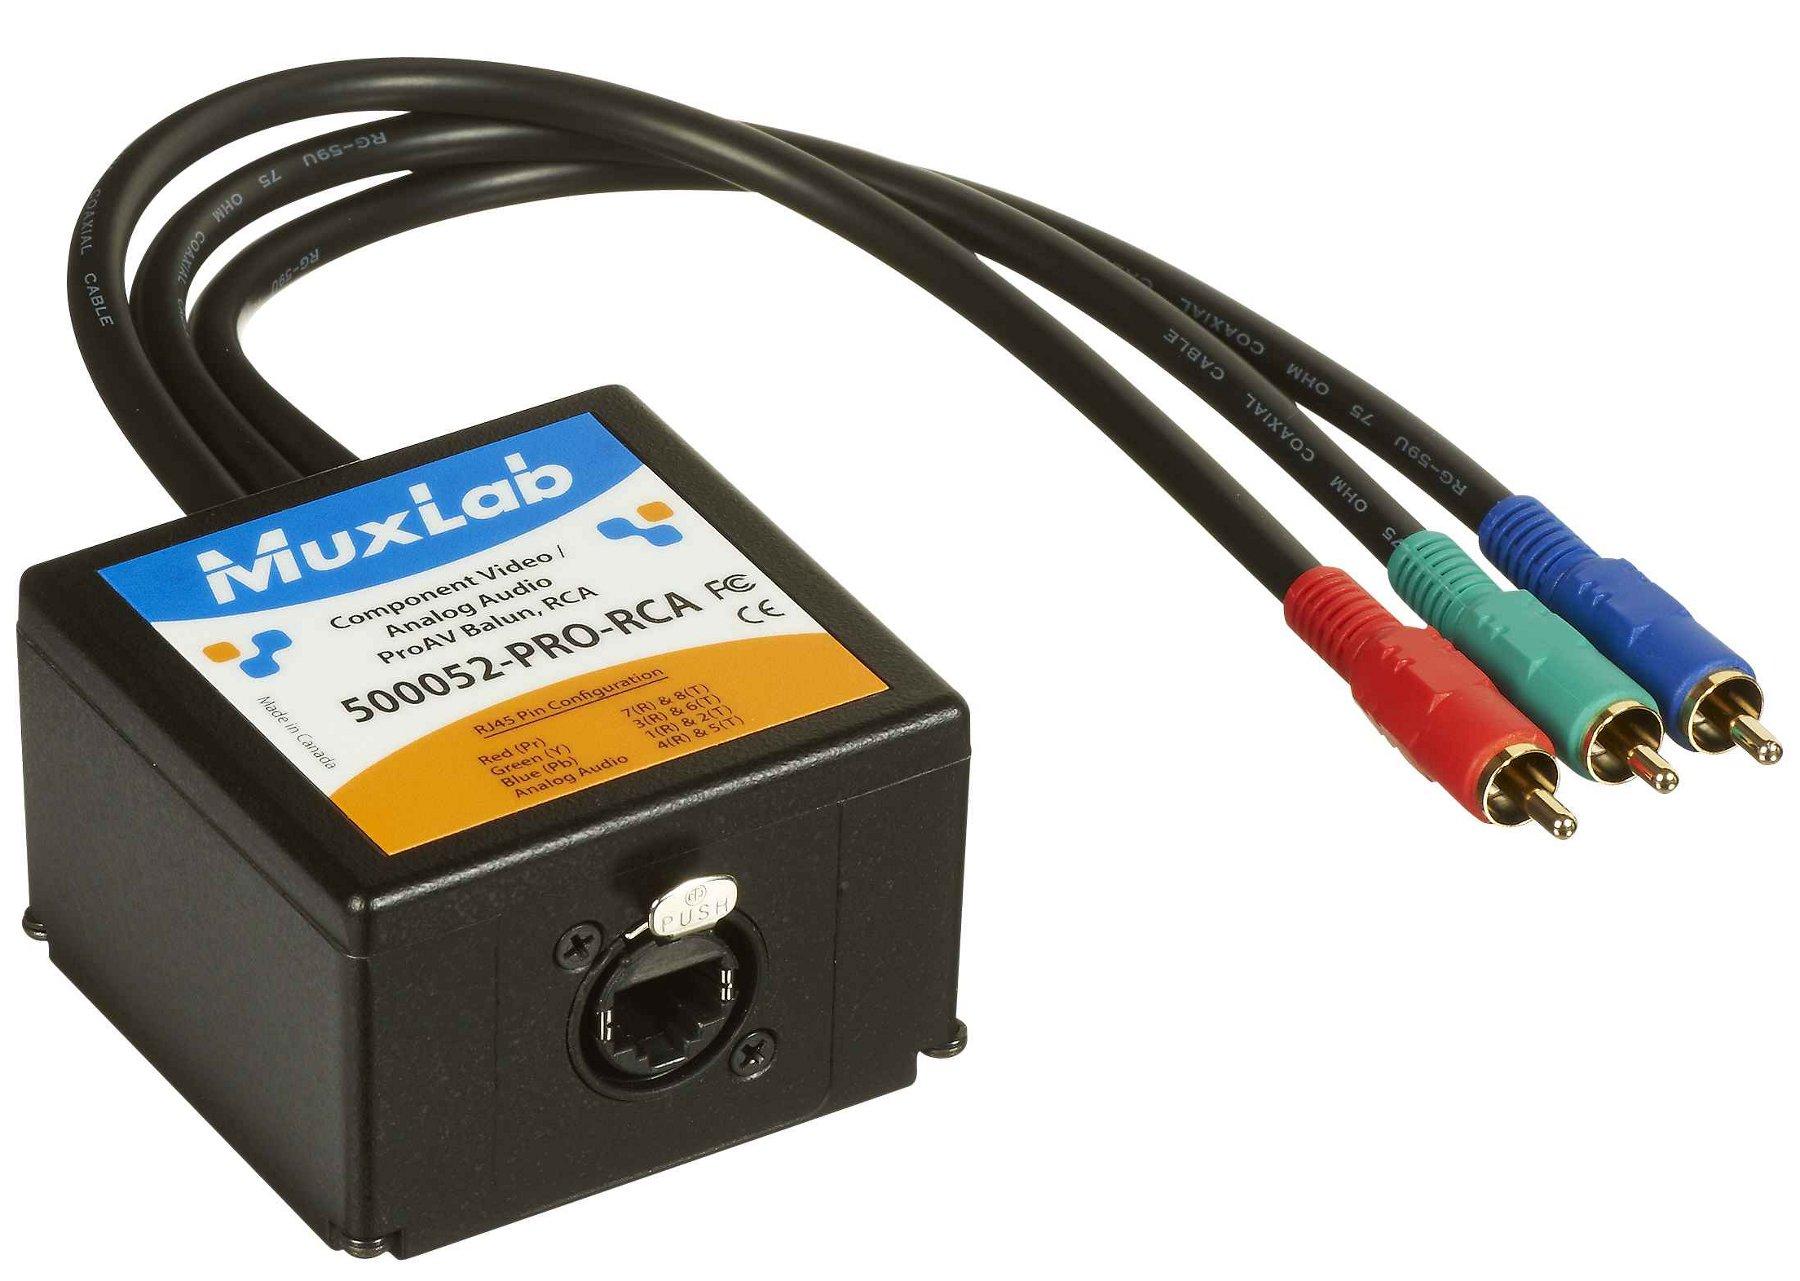 Component Video/Analog Audio ProAV Balun